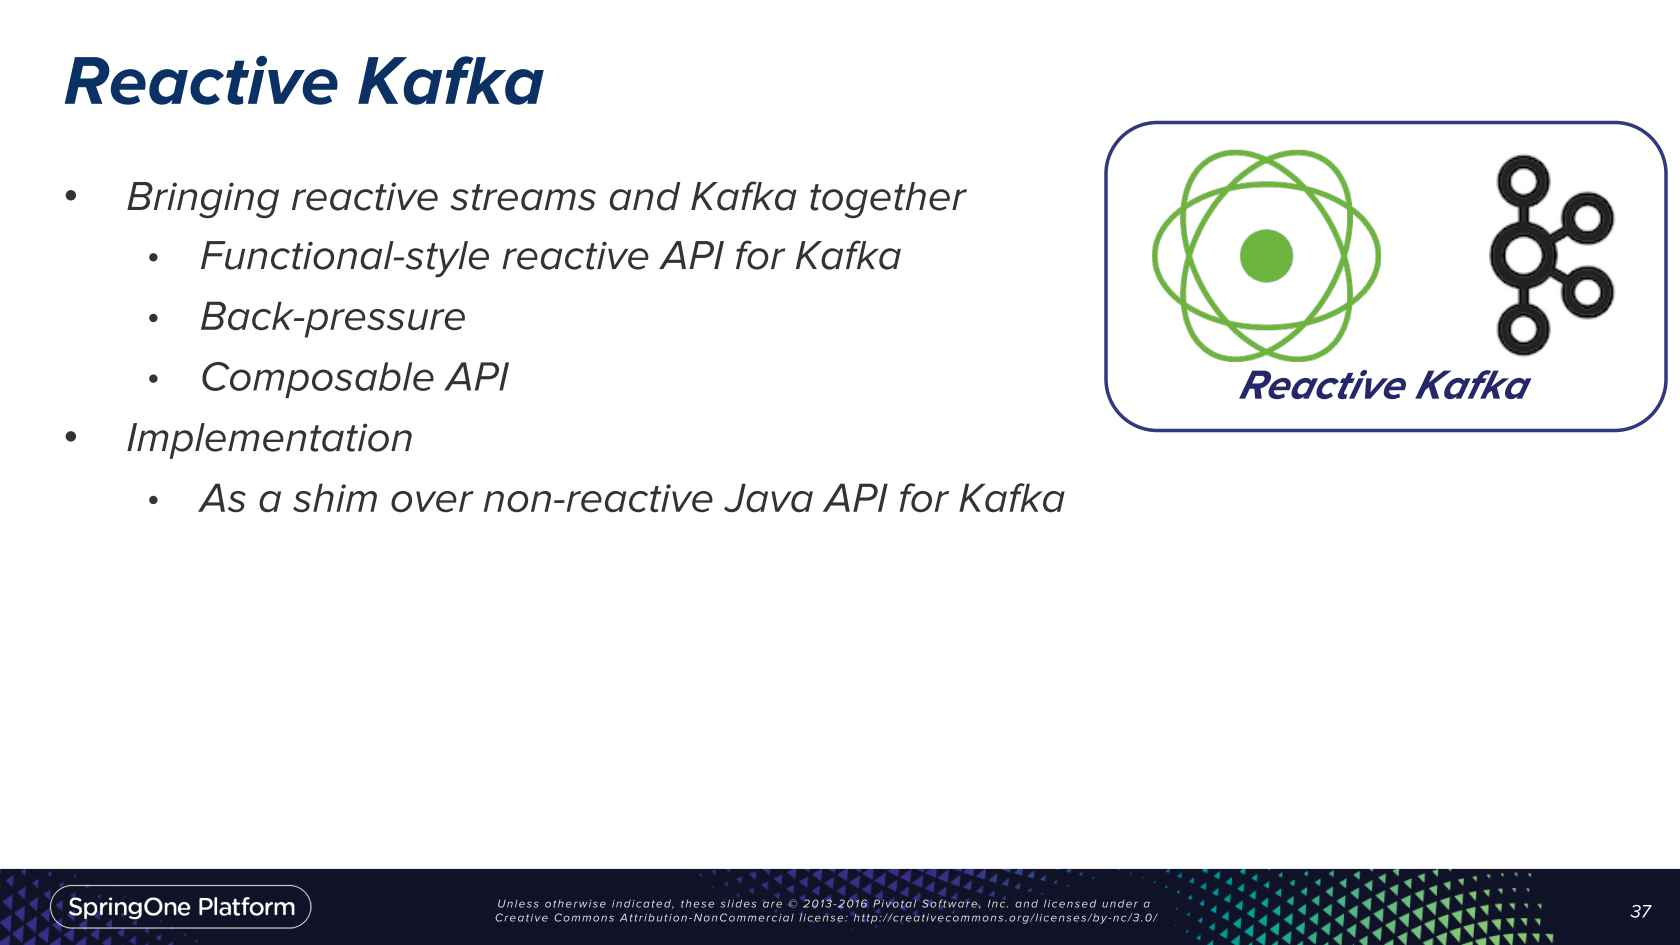 Reactive Kafka